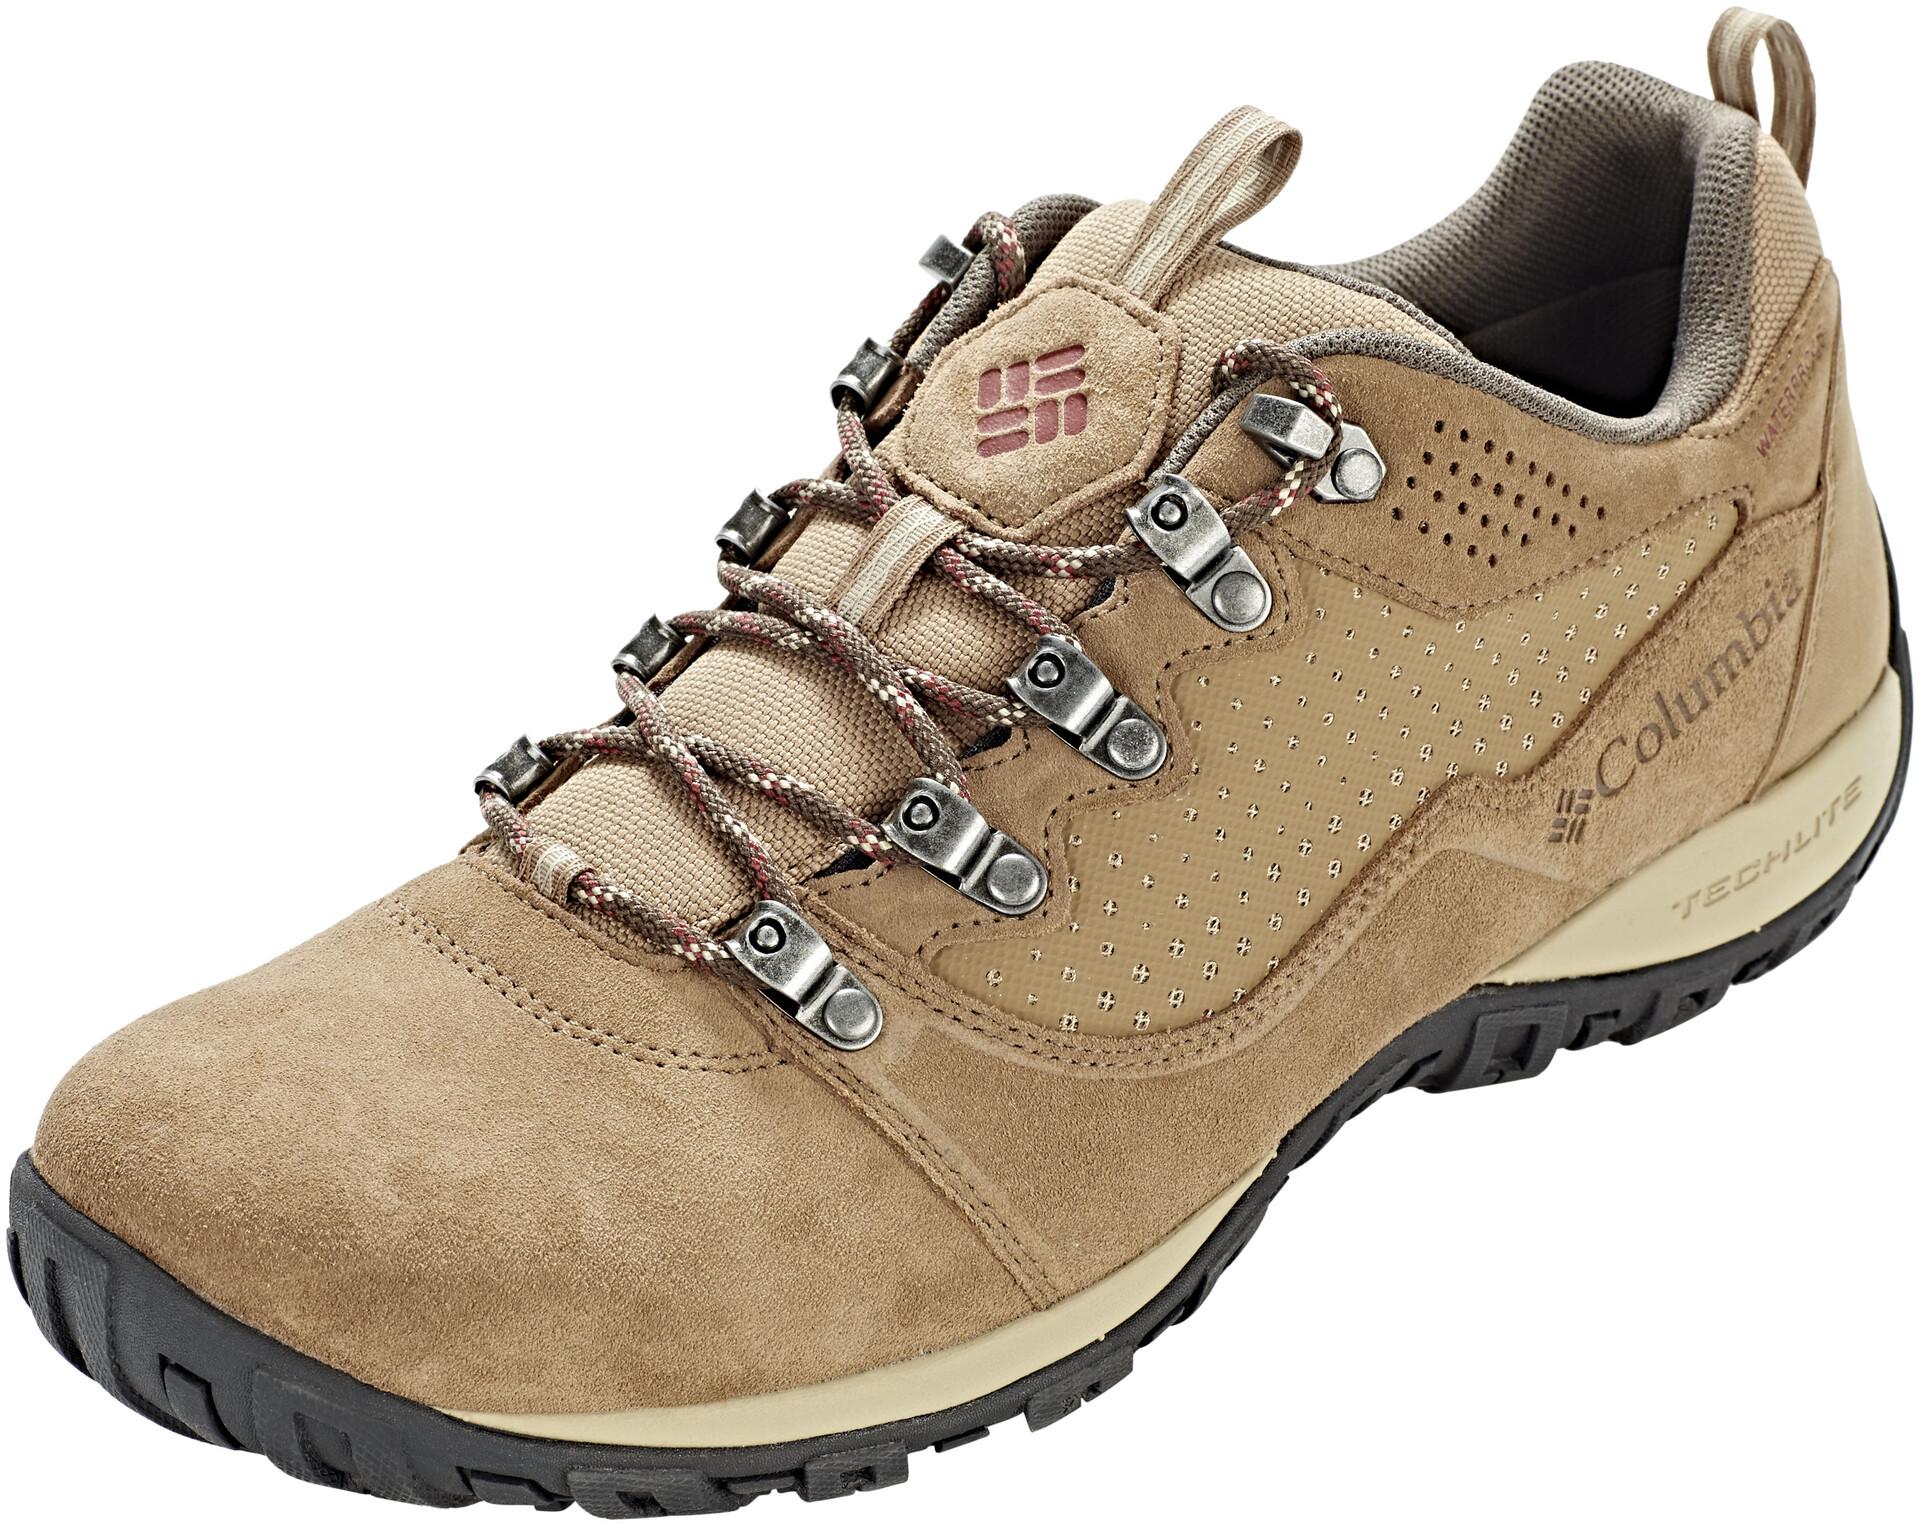 Chaussures Venture Wp Columbia Peakfreak Homme Suede Low Marron vU6pwHxzqw